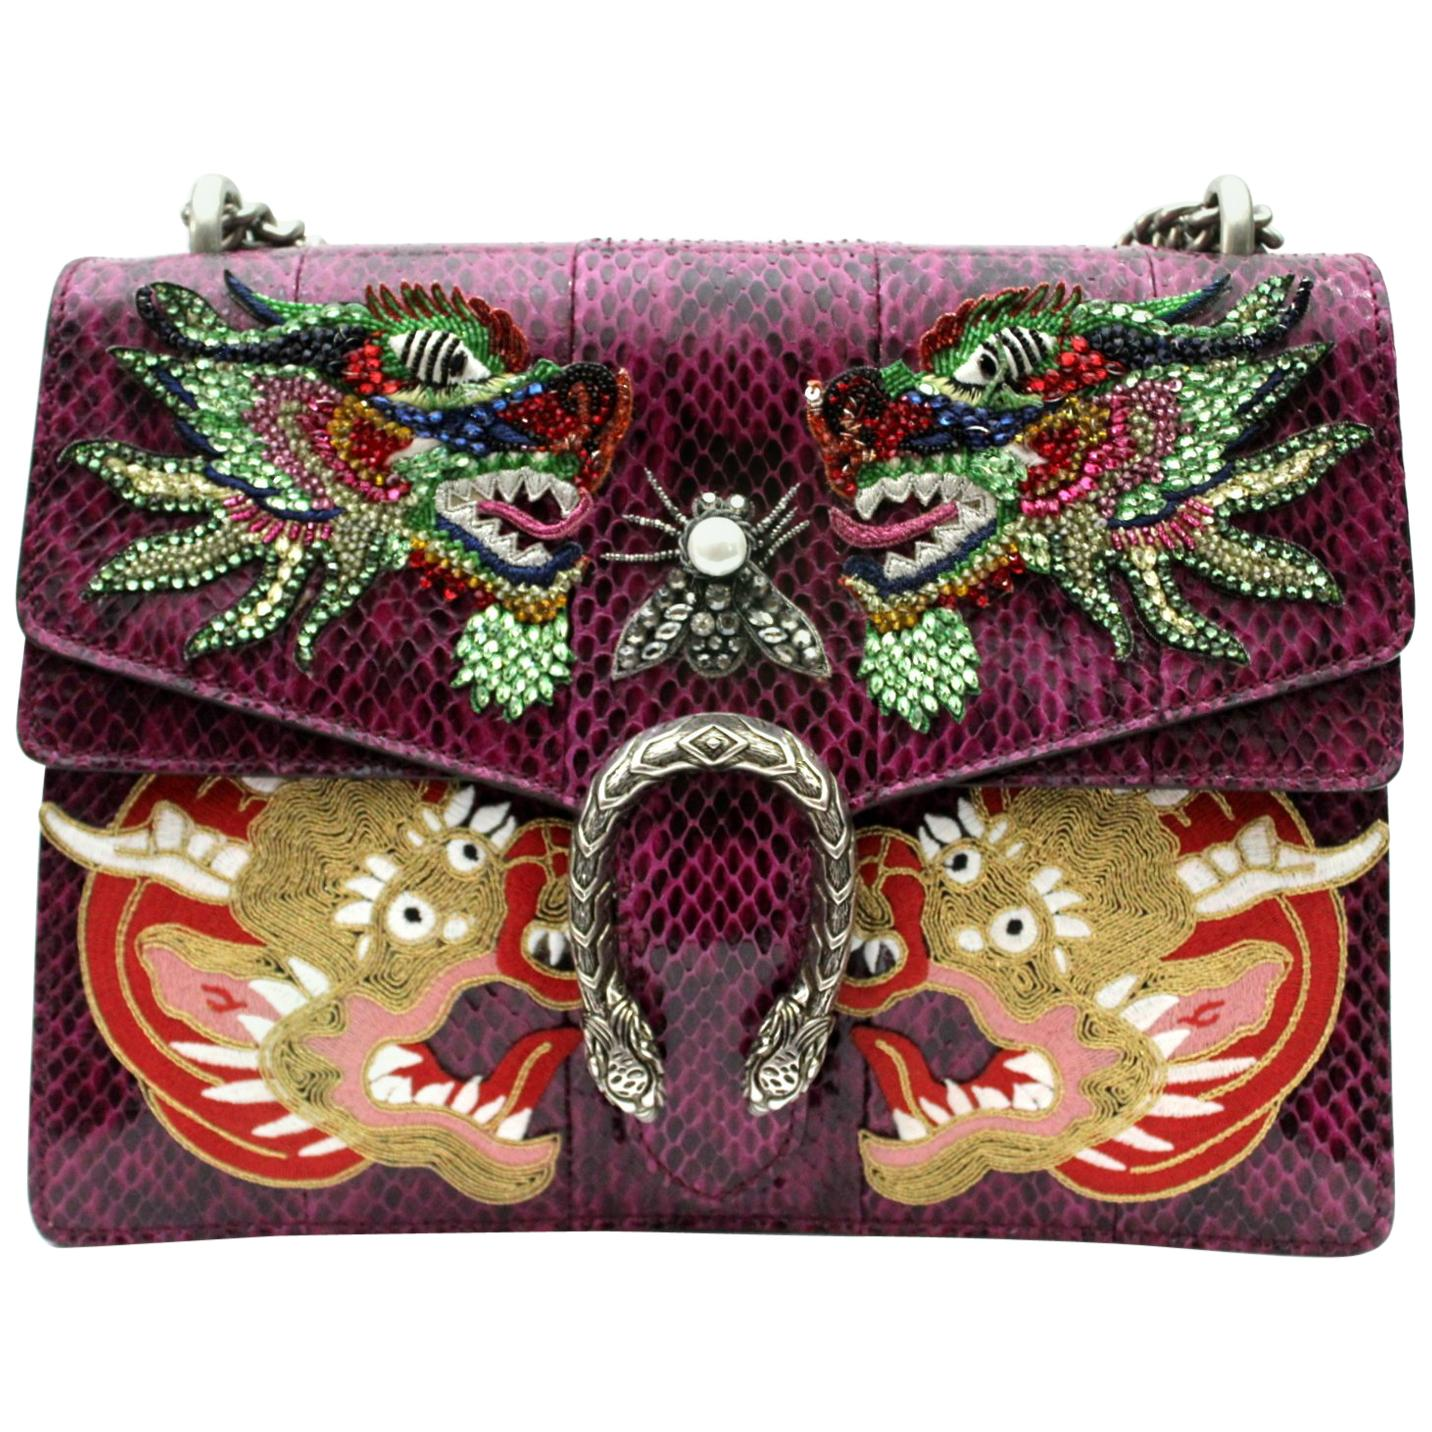 Gucci Dionysus Purple Leather Bag